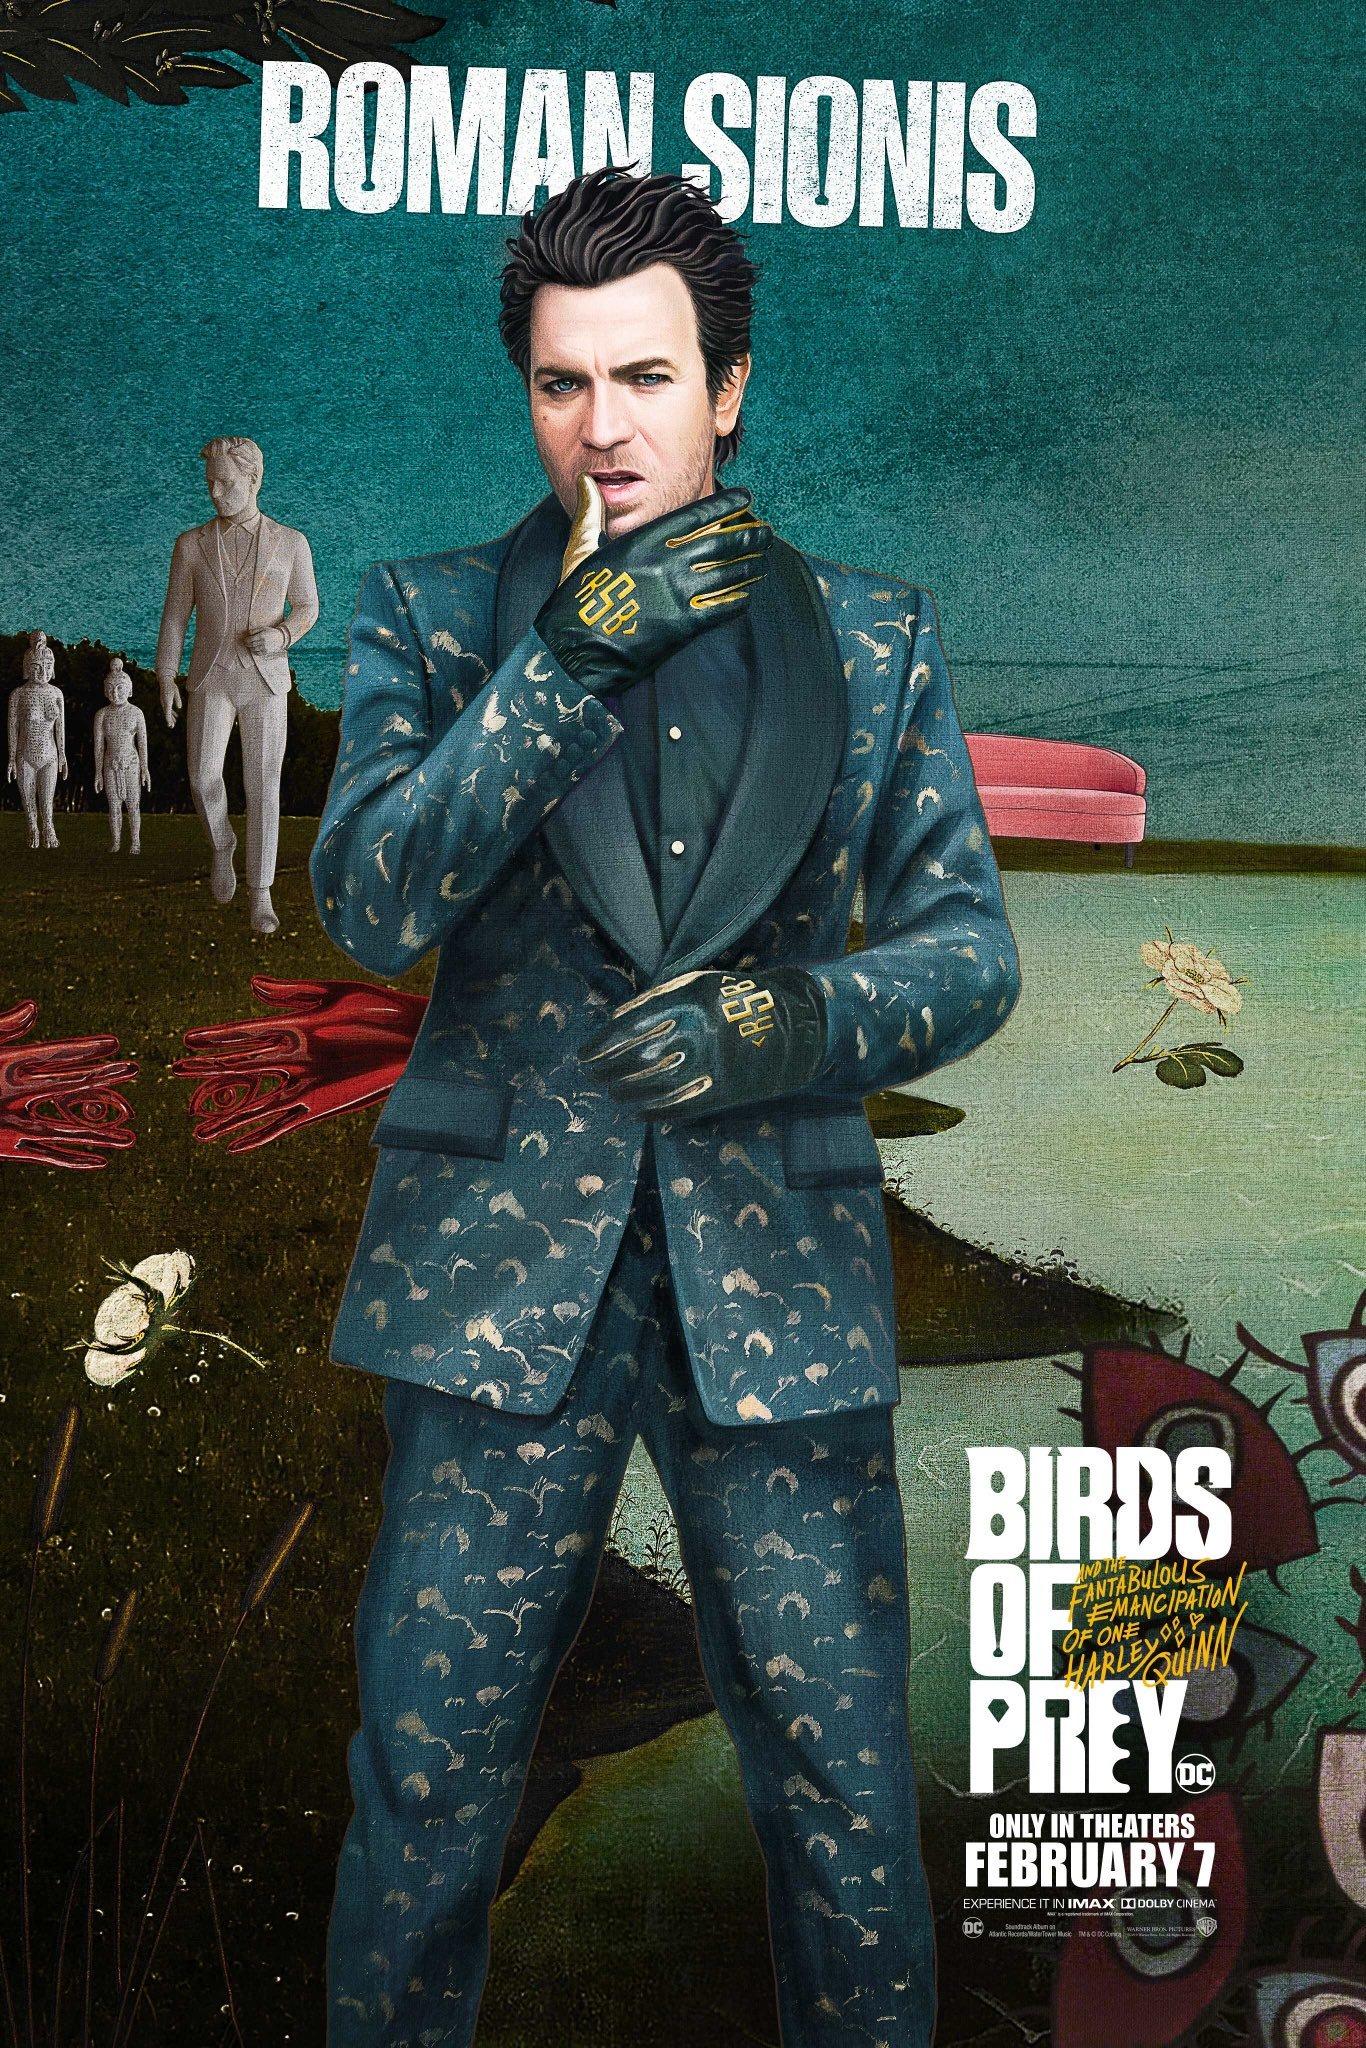 szmk_birds_of_prey_ragadozo_madarak_harley_quinn_csodasztikus_felszabadulasa_dc_batman_gotham_joker_baseball_bruce_10.jpg